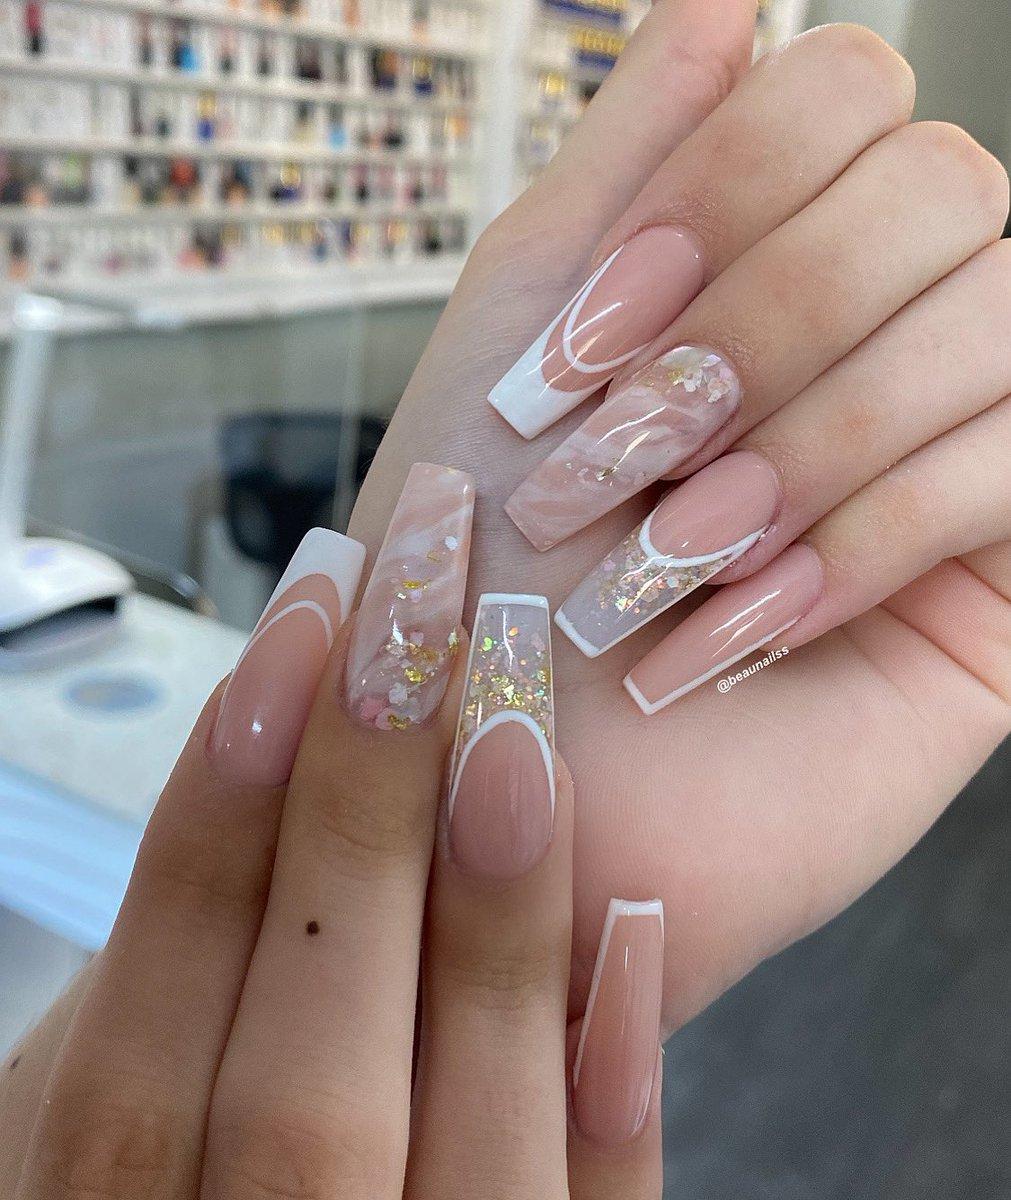 Nails on point @_livshannon 💅💅😍😍 #beaunailss #beautifulnailssheffield #sheffieldnails #nailsinsheffield #sheffield #sheffieldissuper #acrylicnails #nailart #nailstagram #naildesigns #nailsmagazine #nailsonfleek #naillover #naillove #coffinnails #ballerinanails #stilettonails https://t.co/19o6rgAxRJ